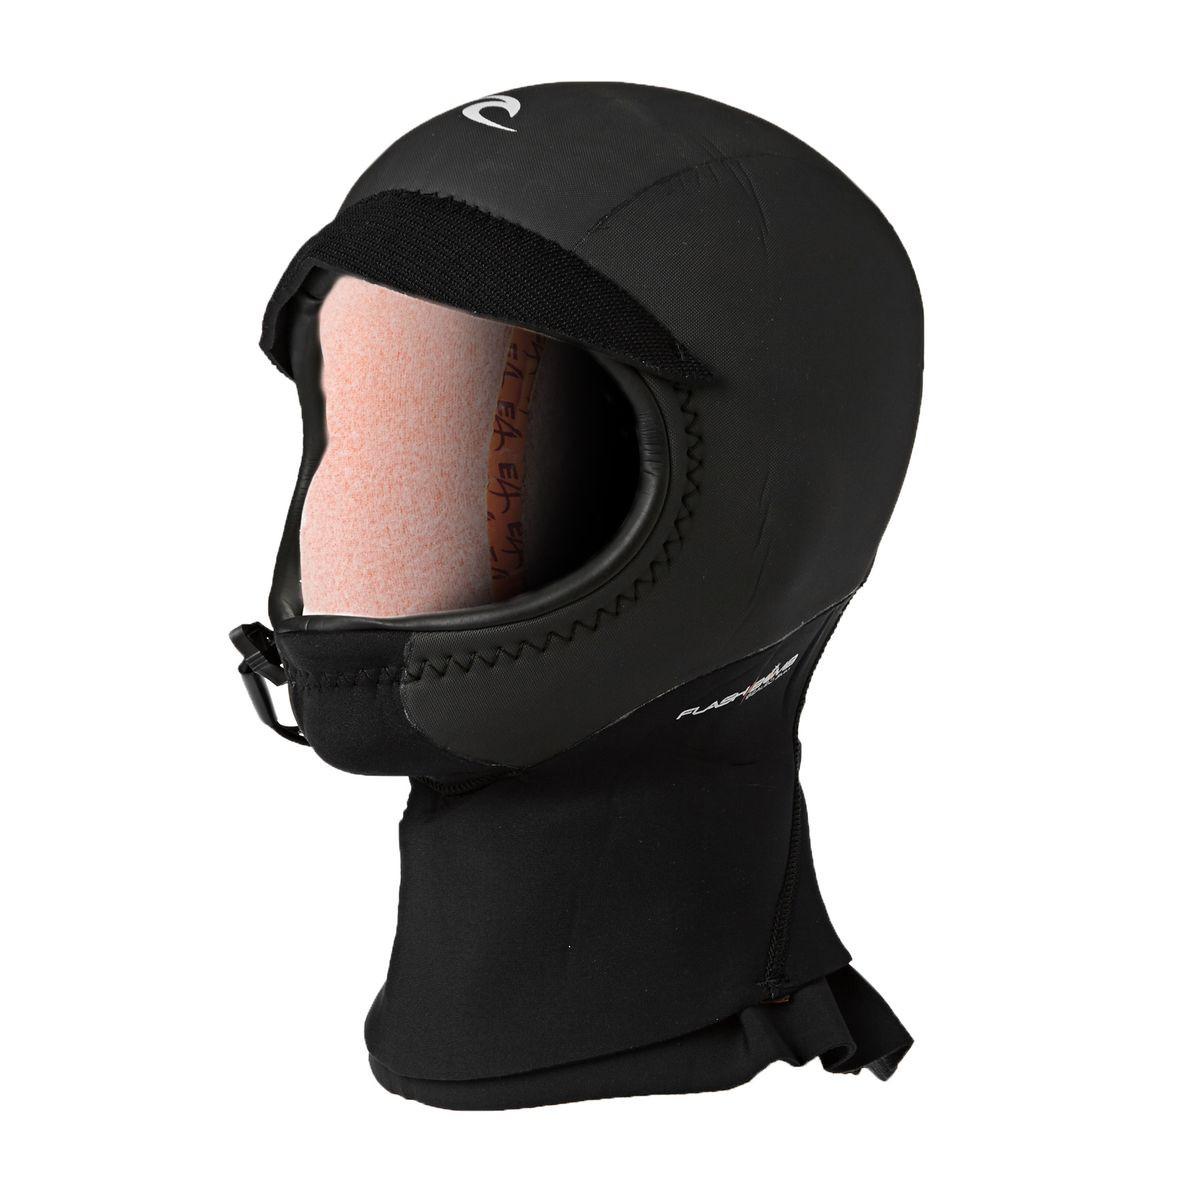 Rip Curl Flashbomb 3mm Wetsuit Hood - Black